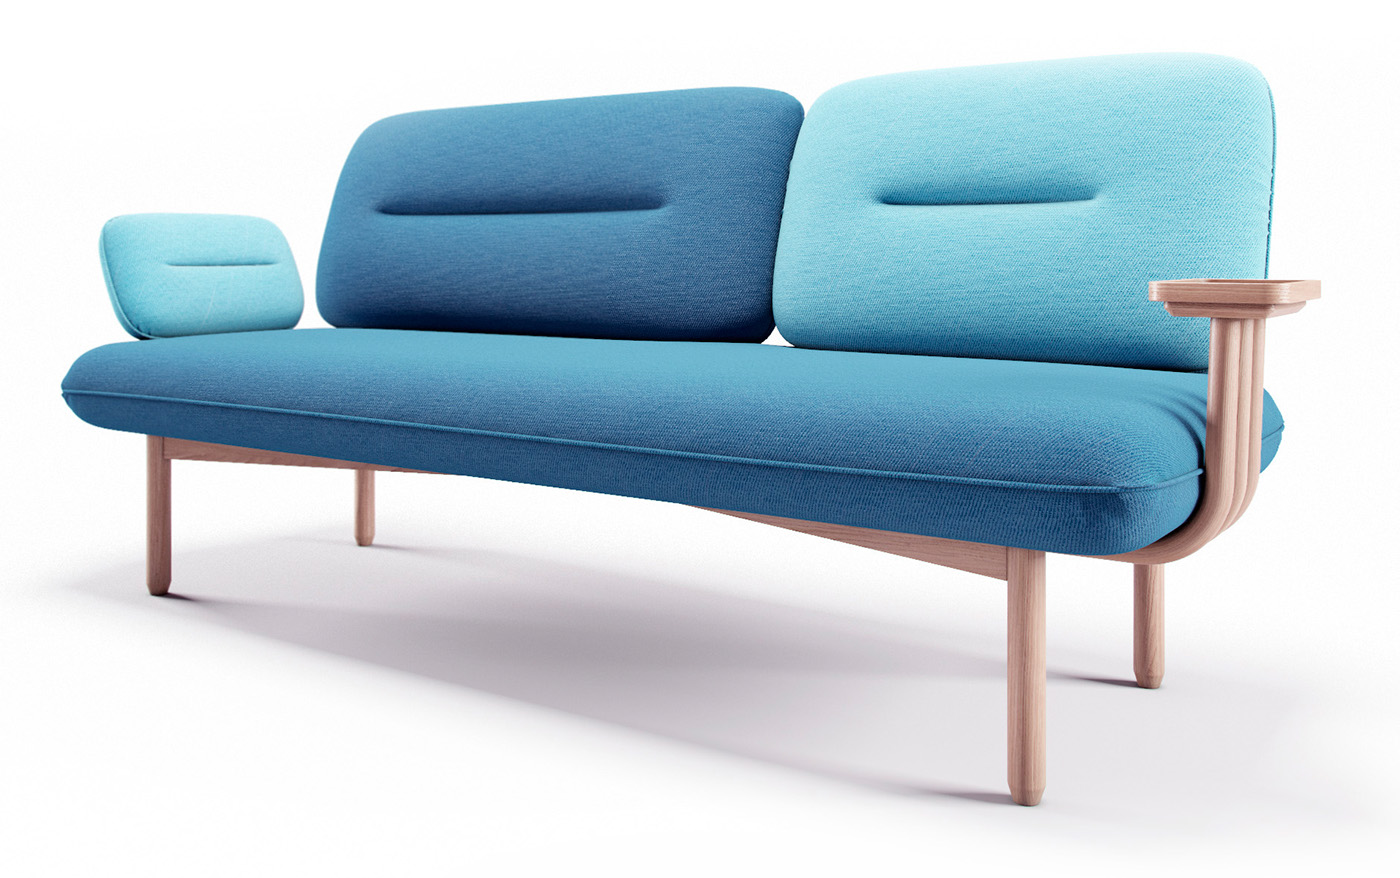 sofa armchair visualization furniture CG диван кресло визуализация